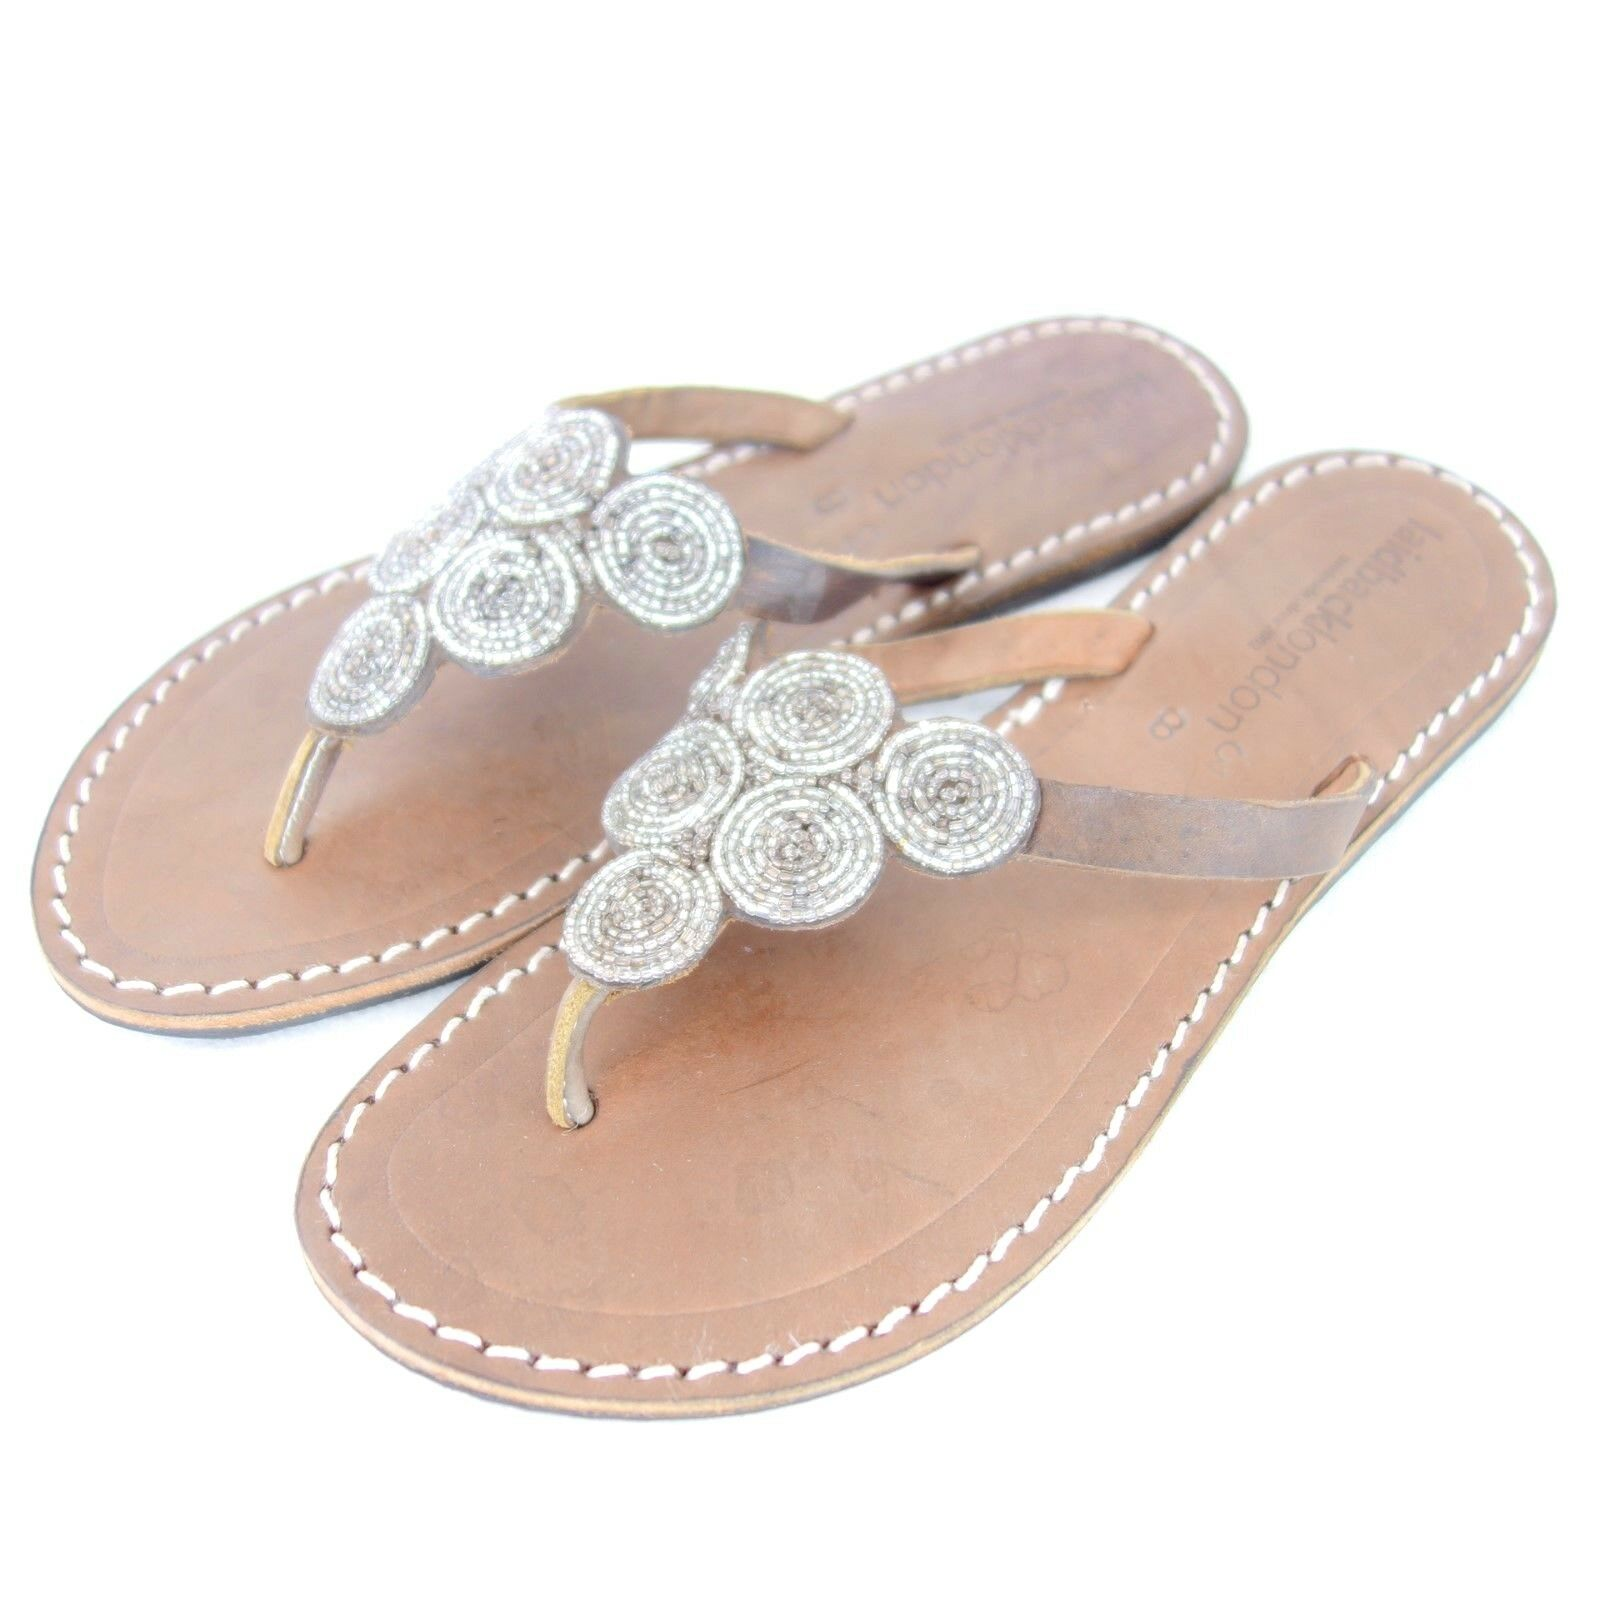 LAIDBACK LONDON Damen Sandalen Zehentrenner Schuhe 36 Leder Ziersteine NEU 79 NP